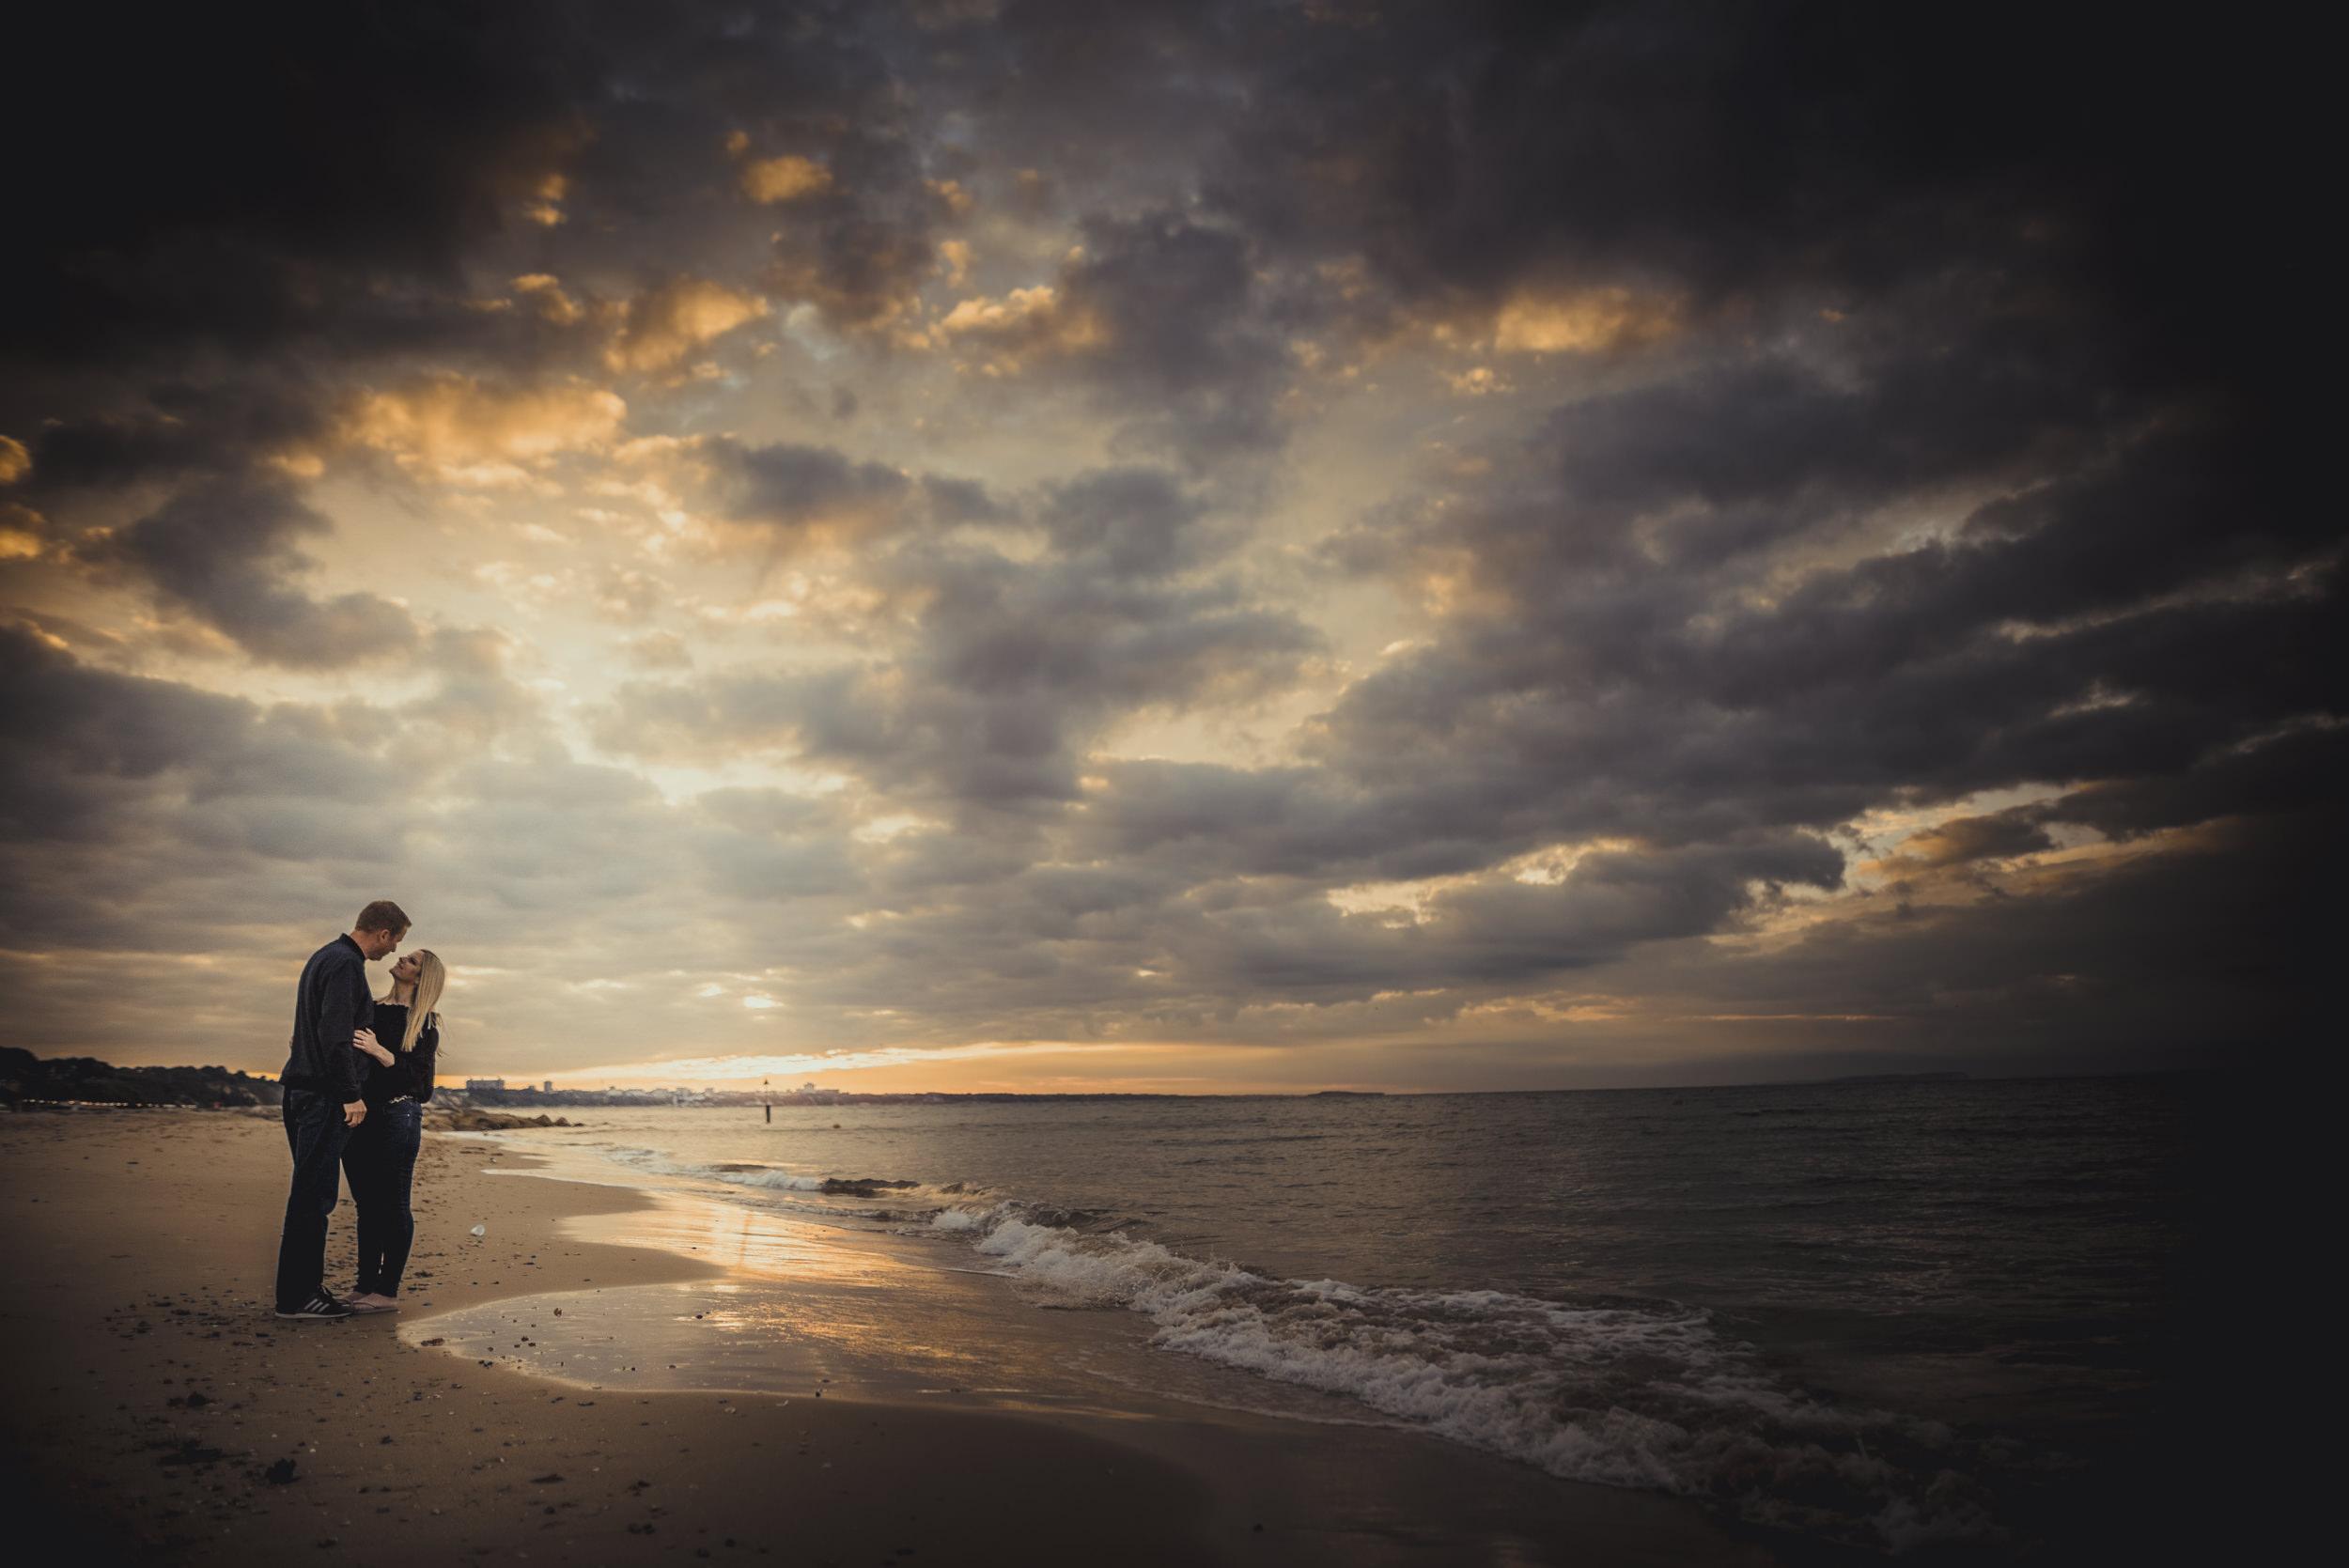 Trisha-and-Robert-Engagement-session-Sandbanks-beach-Poole-Manu-Mendoza-Wedding-Photography-005.jpg